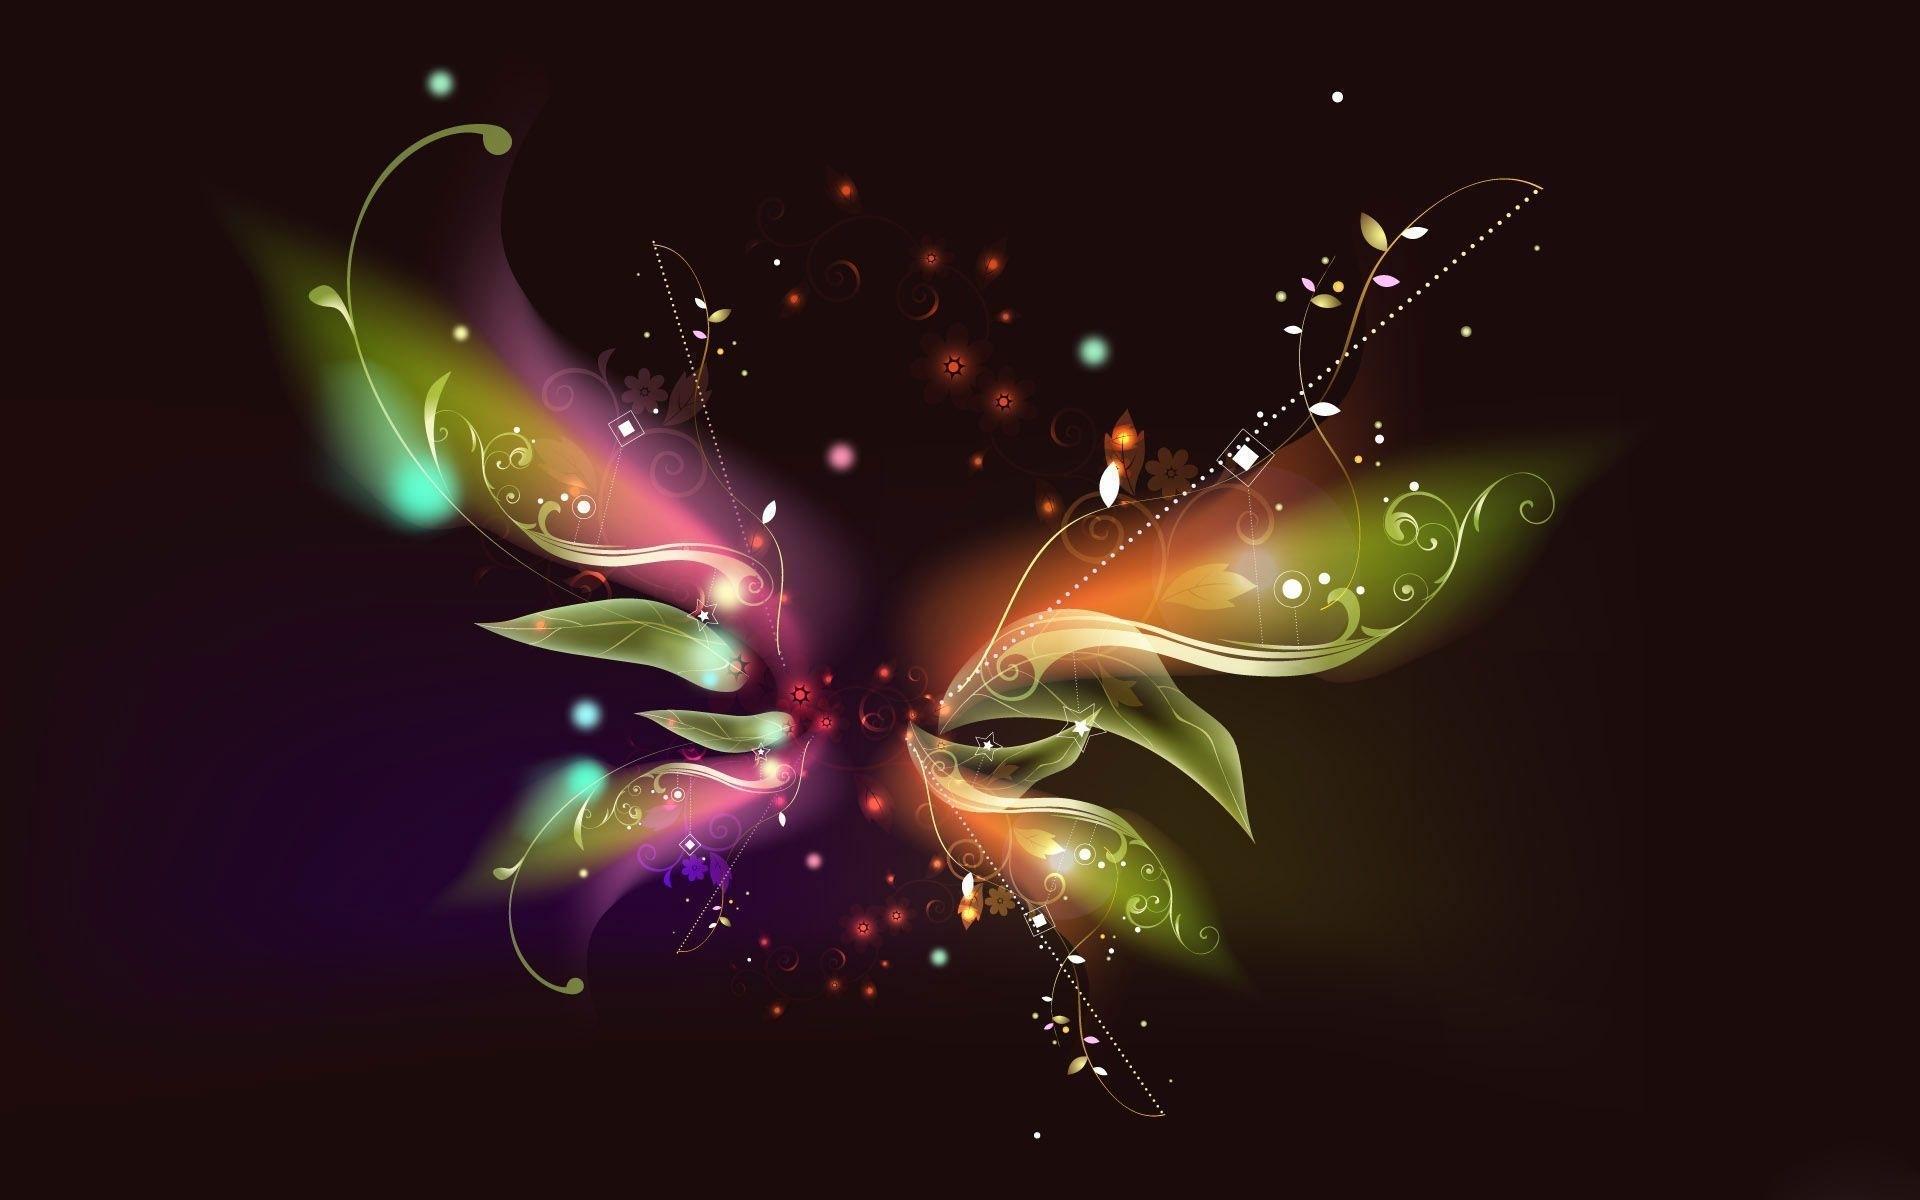 free butterfly desktop backgrounds - wallpaper cave | best games